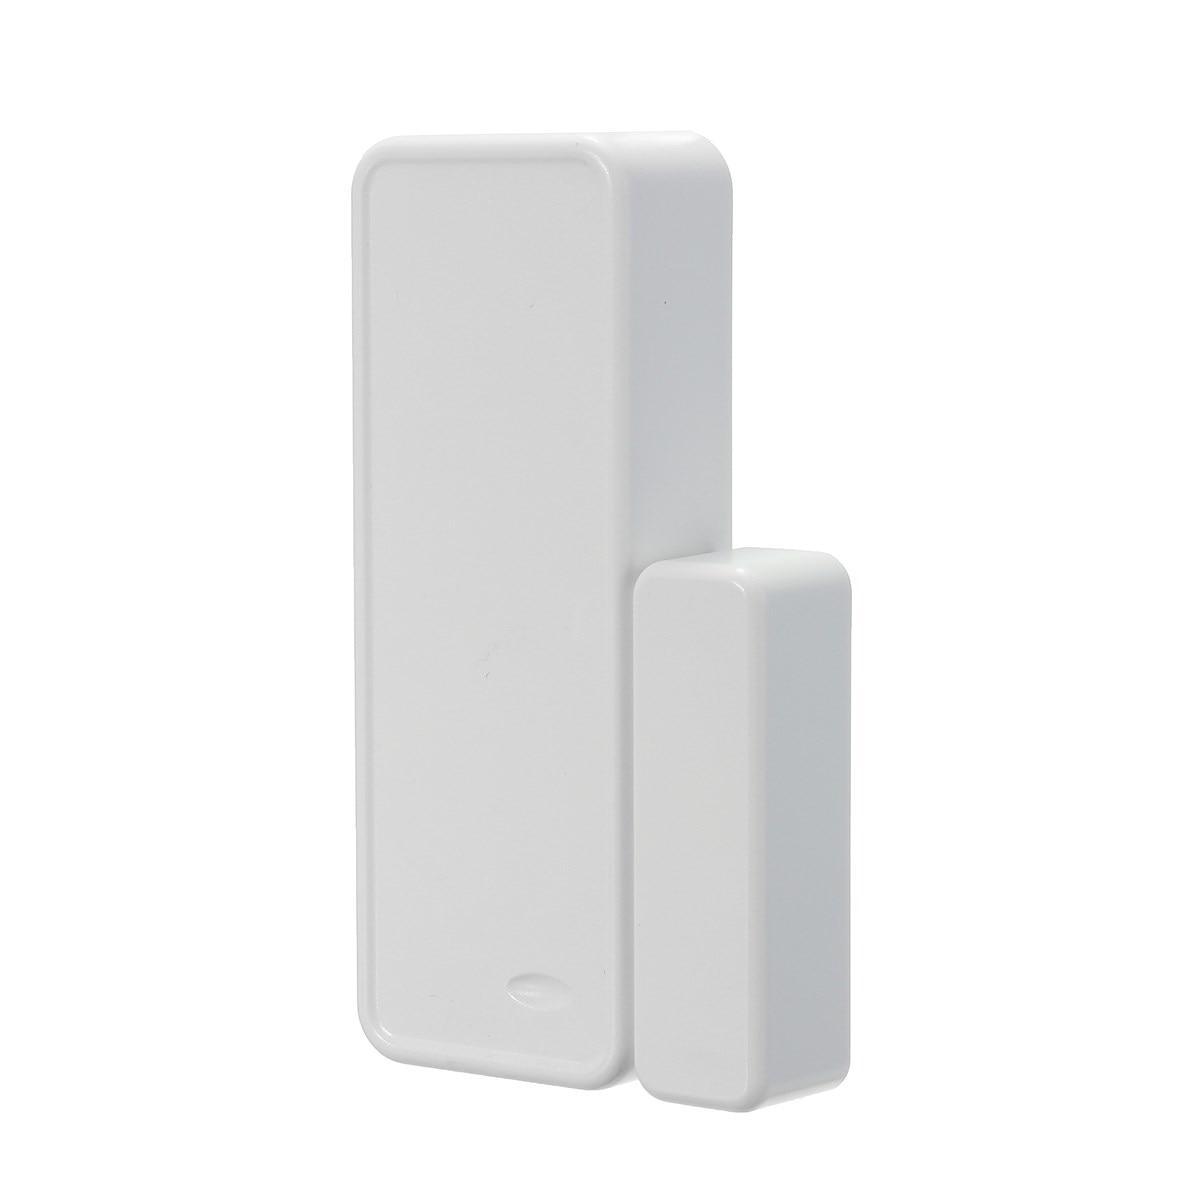 Safurance Wireless Alarm Sensors Accessories For G90B PLUS WiFi GSM Home Alarm System Door Sensor hot selling wireless glass break vibration sensor works with s4 alarm system and g90b wifi gsm alarm system